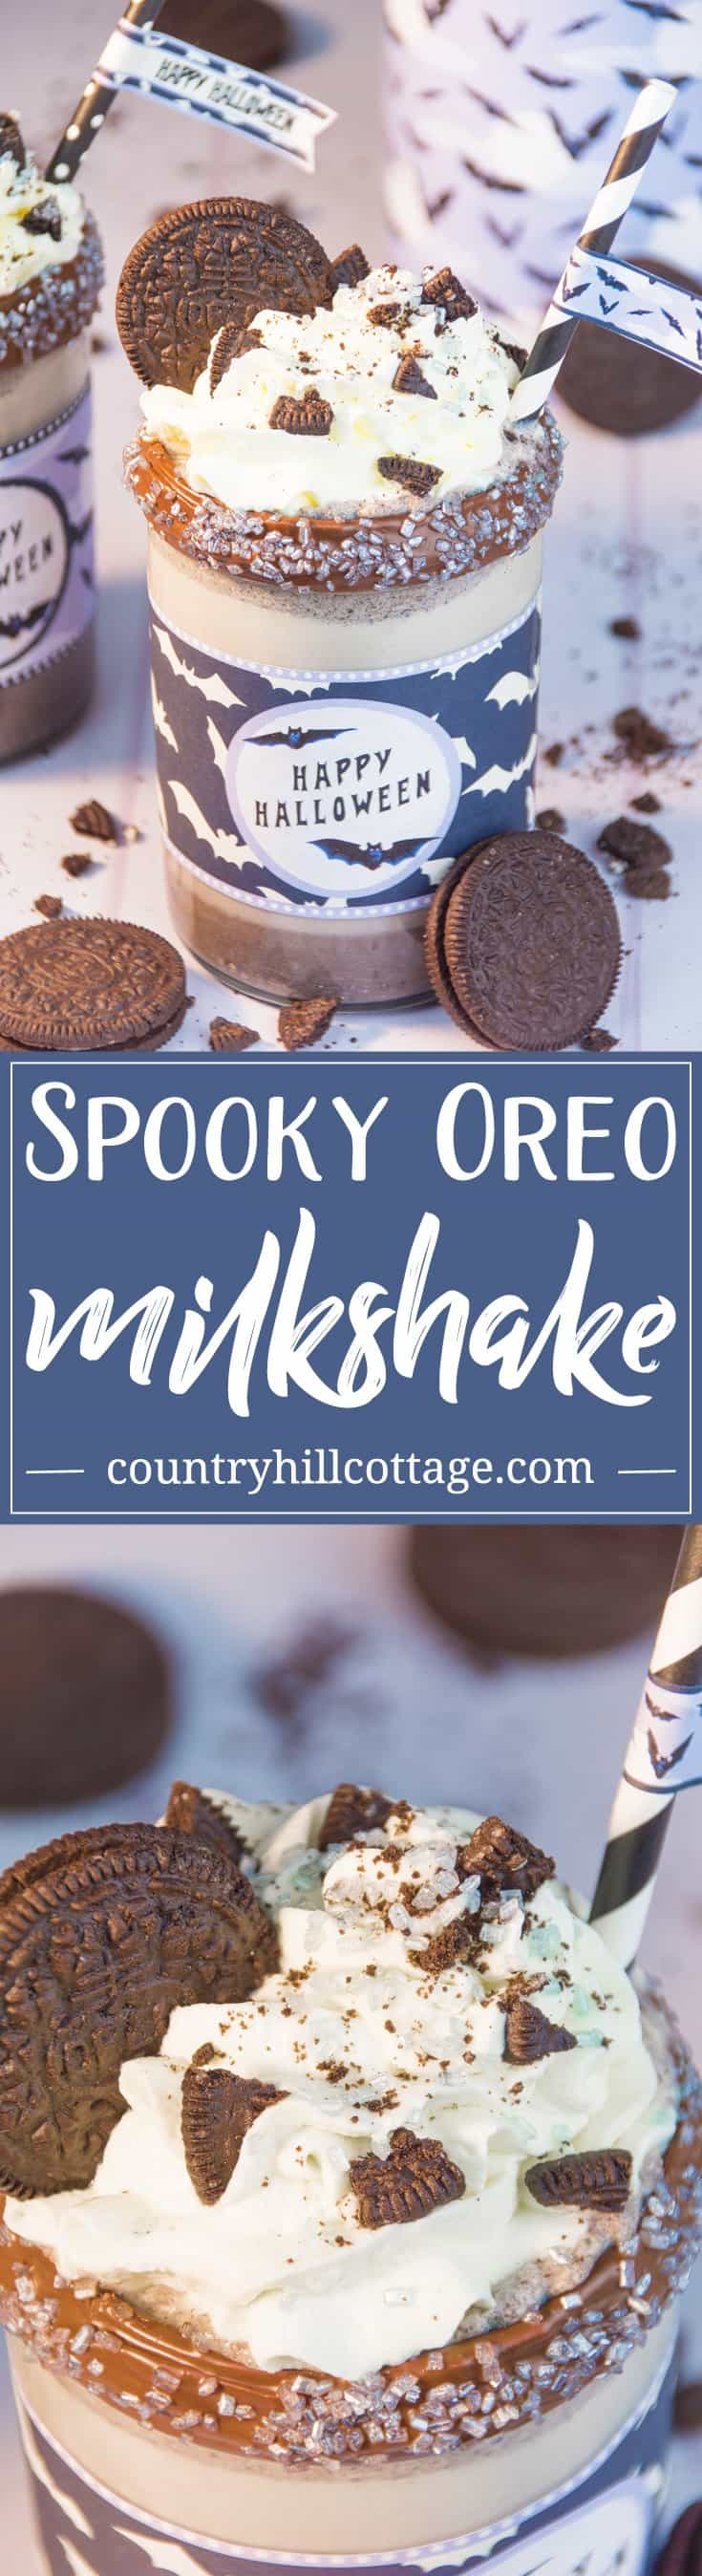 Spooky Oreo Milkshake Recipe and Free Printable Wrapper #Halloween| countryhillcottage.com